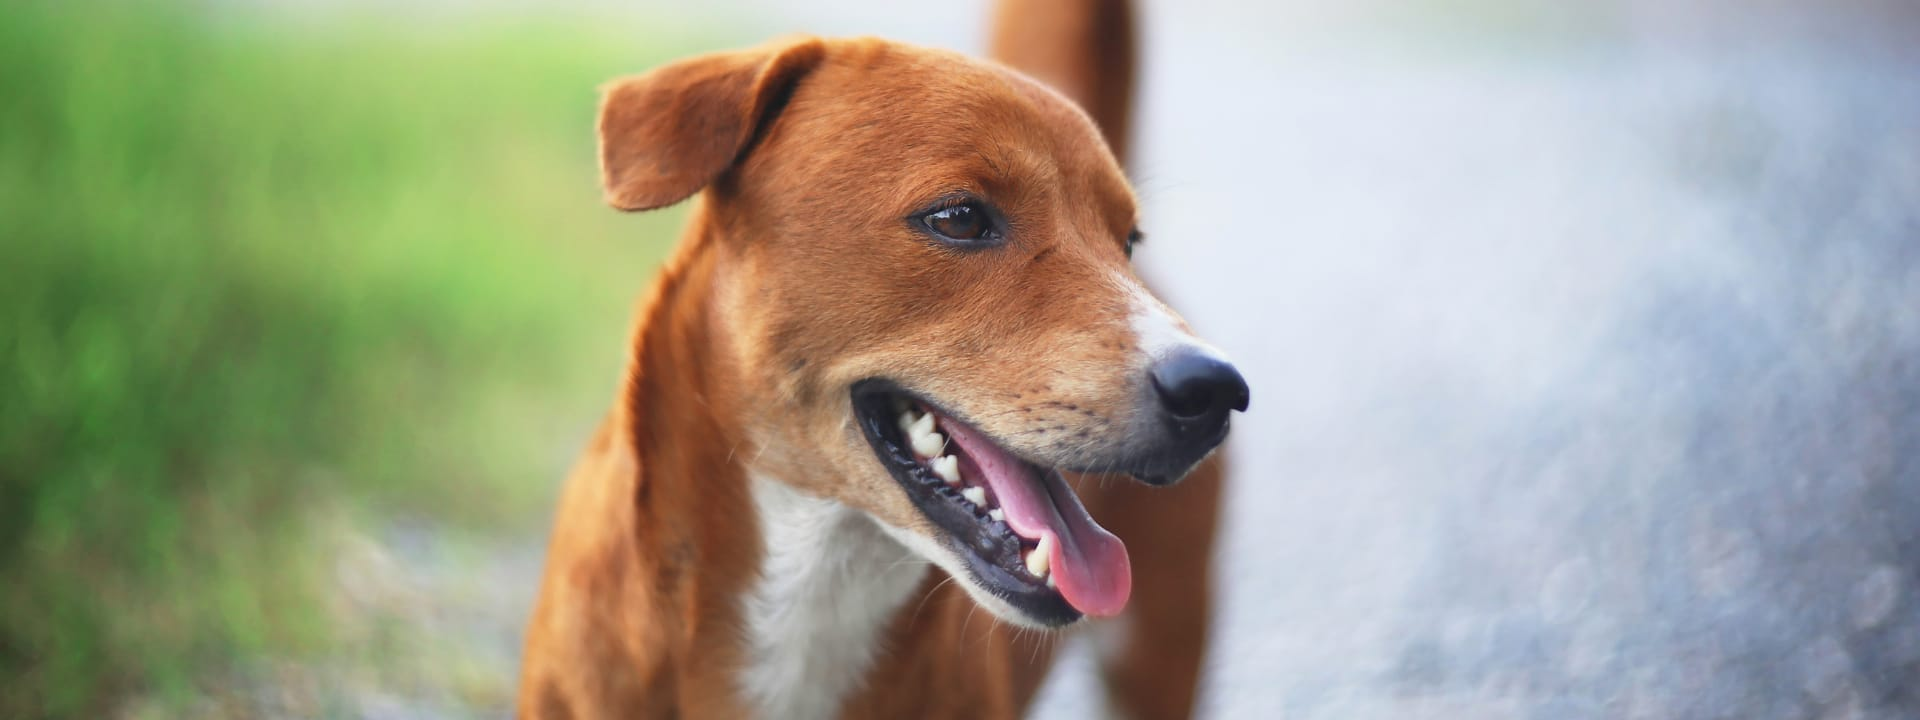 Dog Smile picture